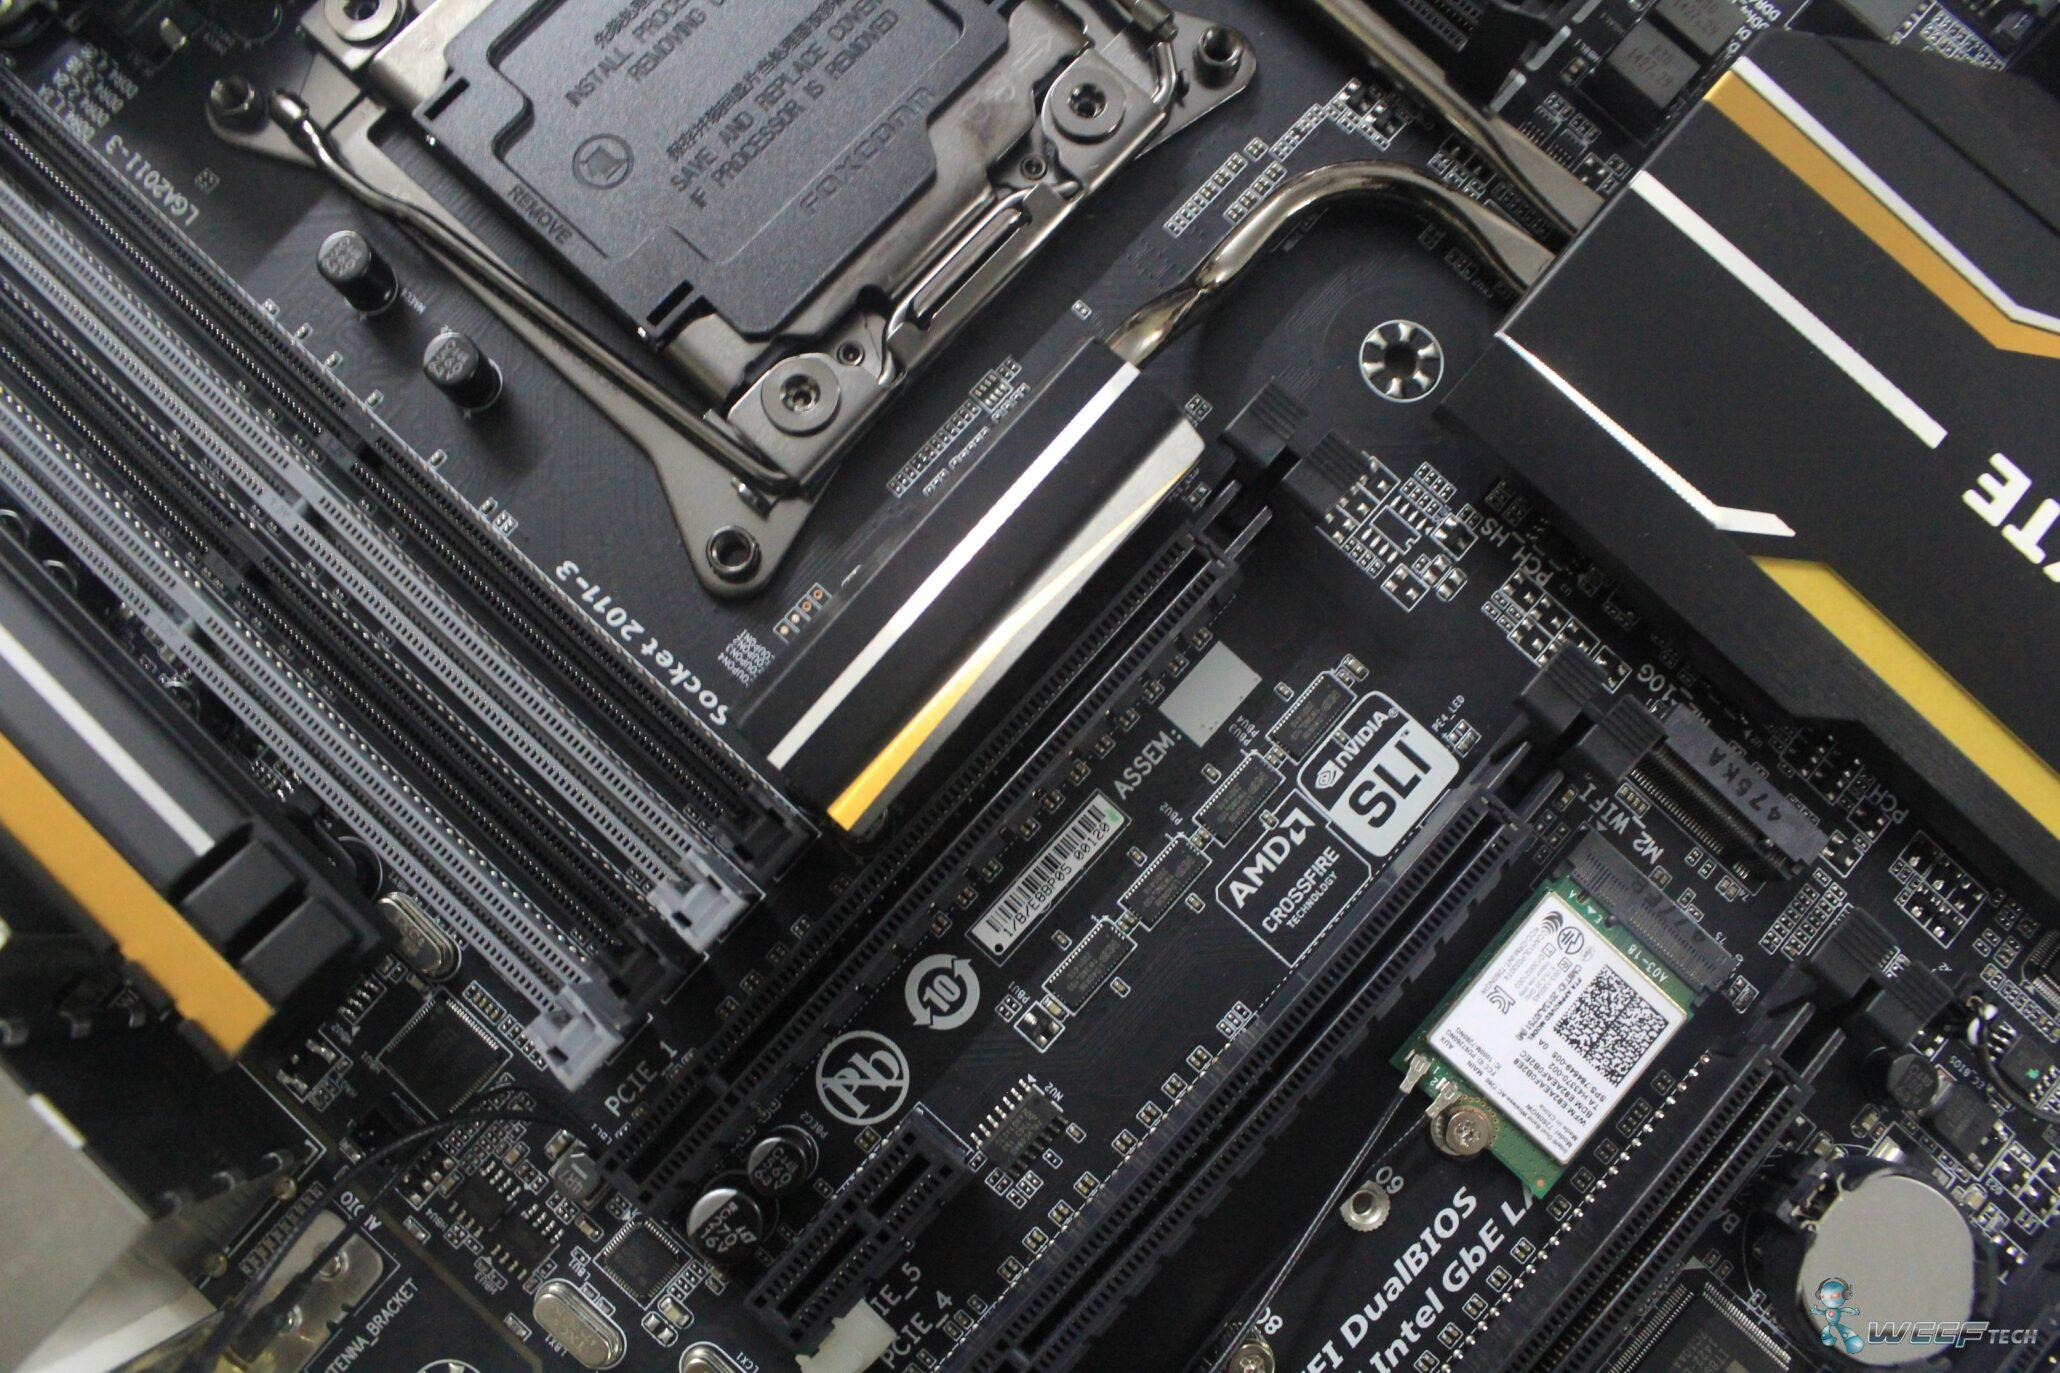 gigabyte-x99-ud7-wifi_middle-heatsink